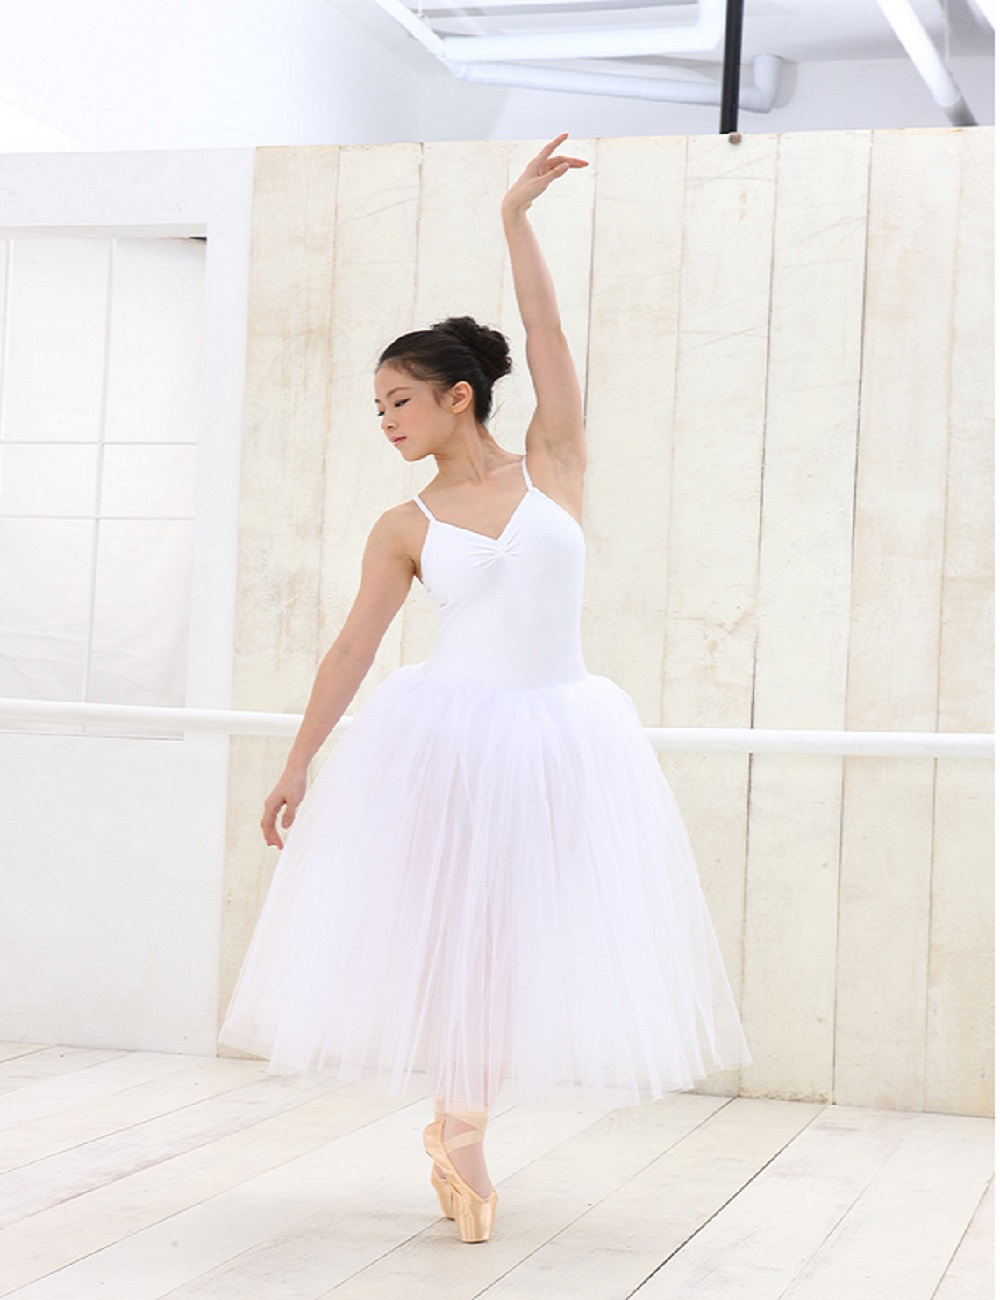 Basic romantic ballet tutu